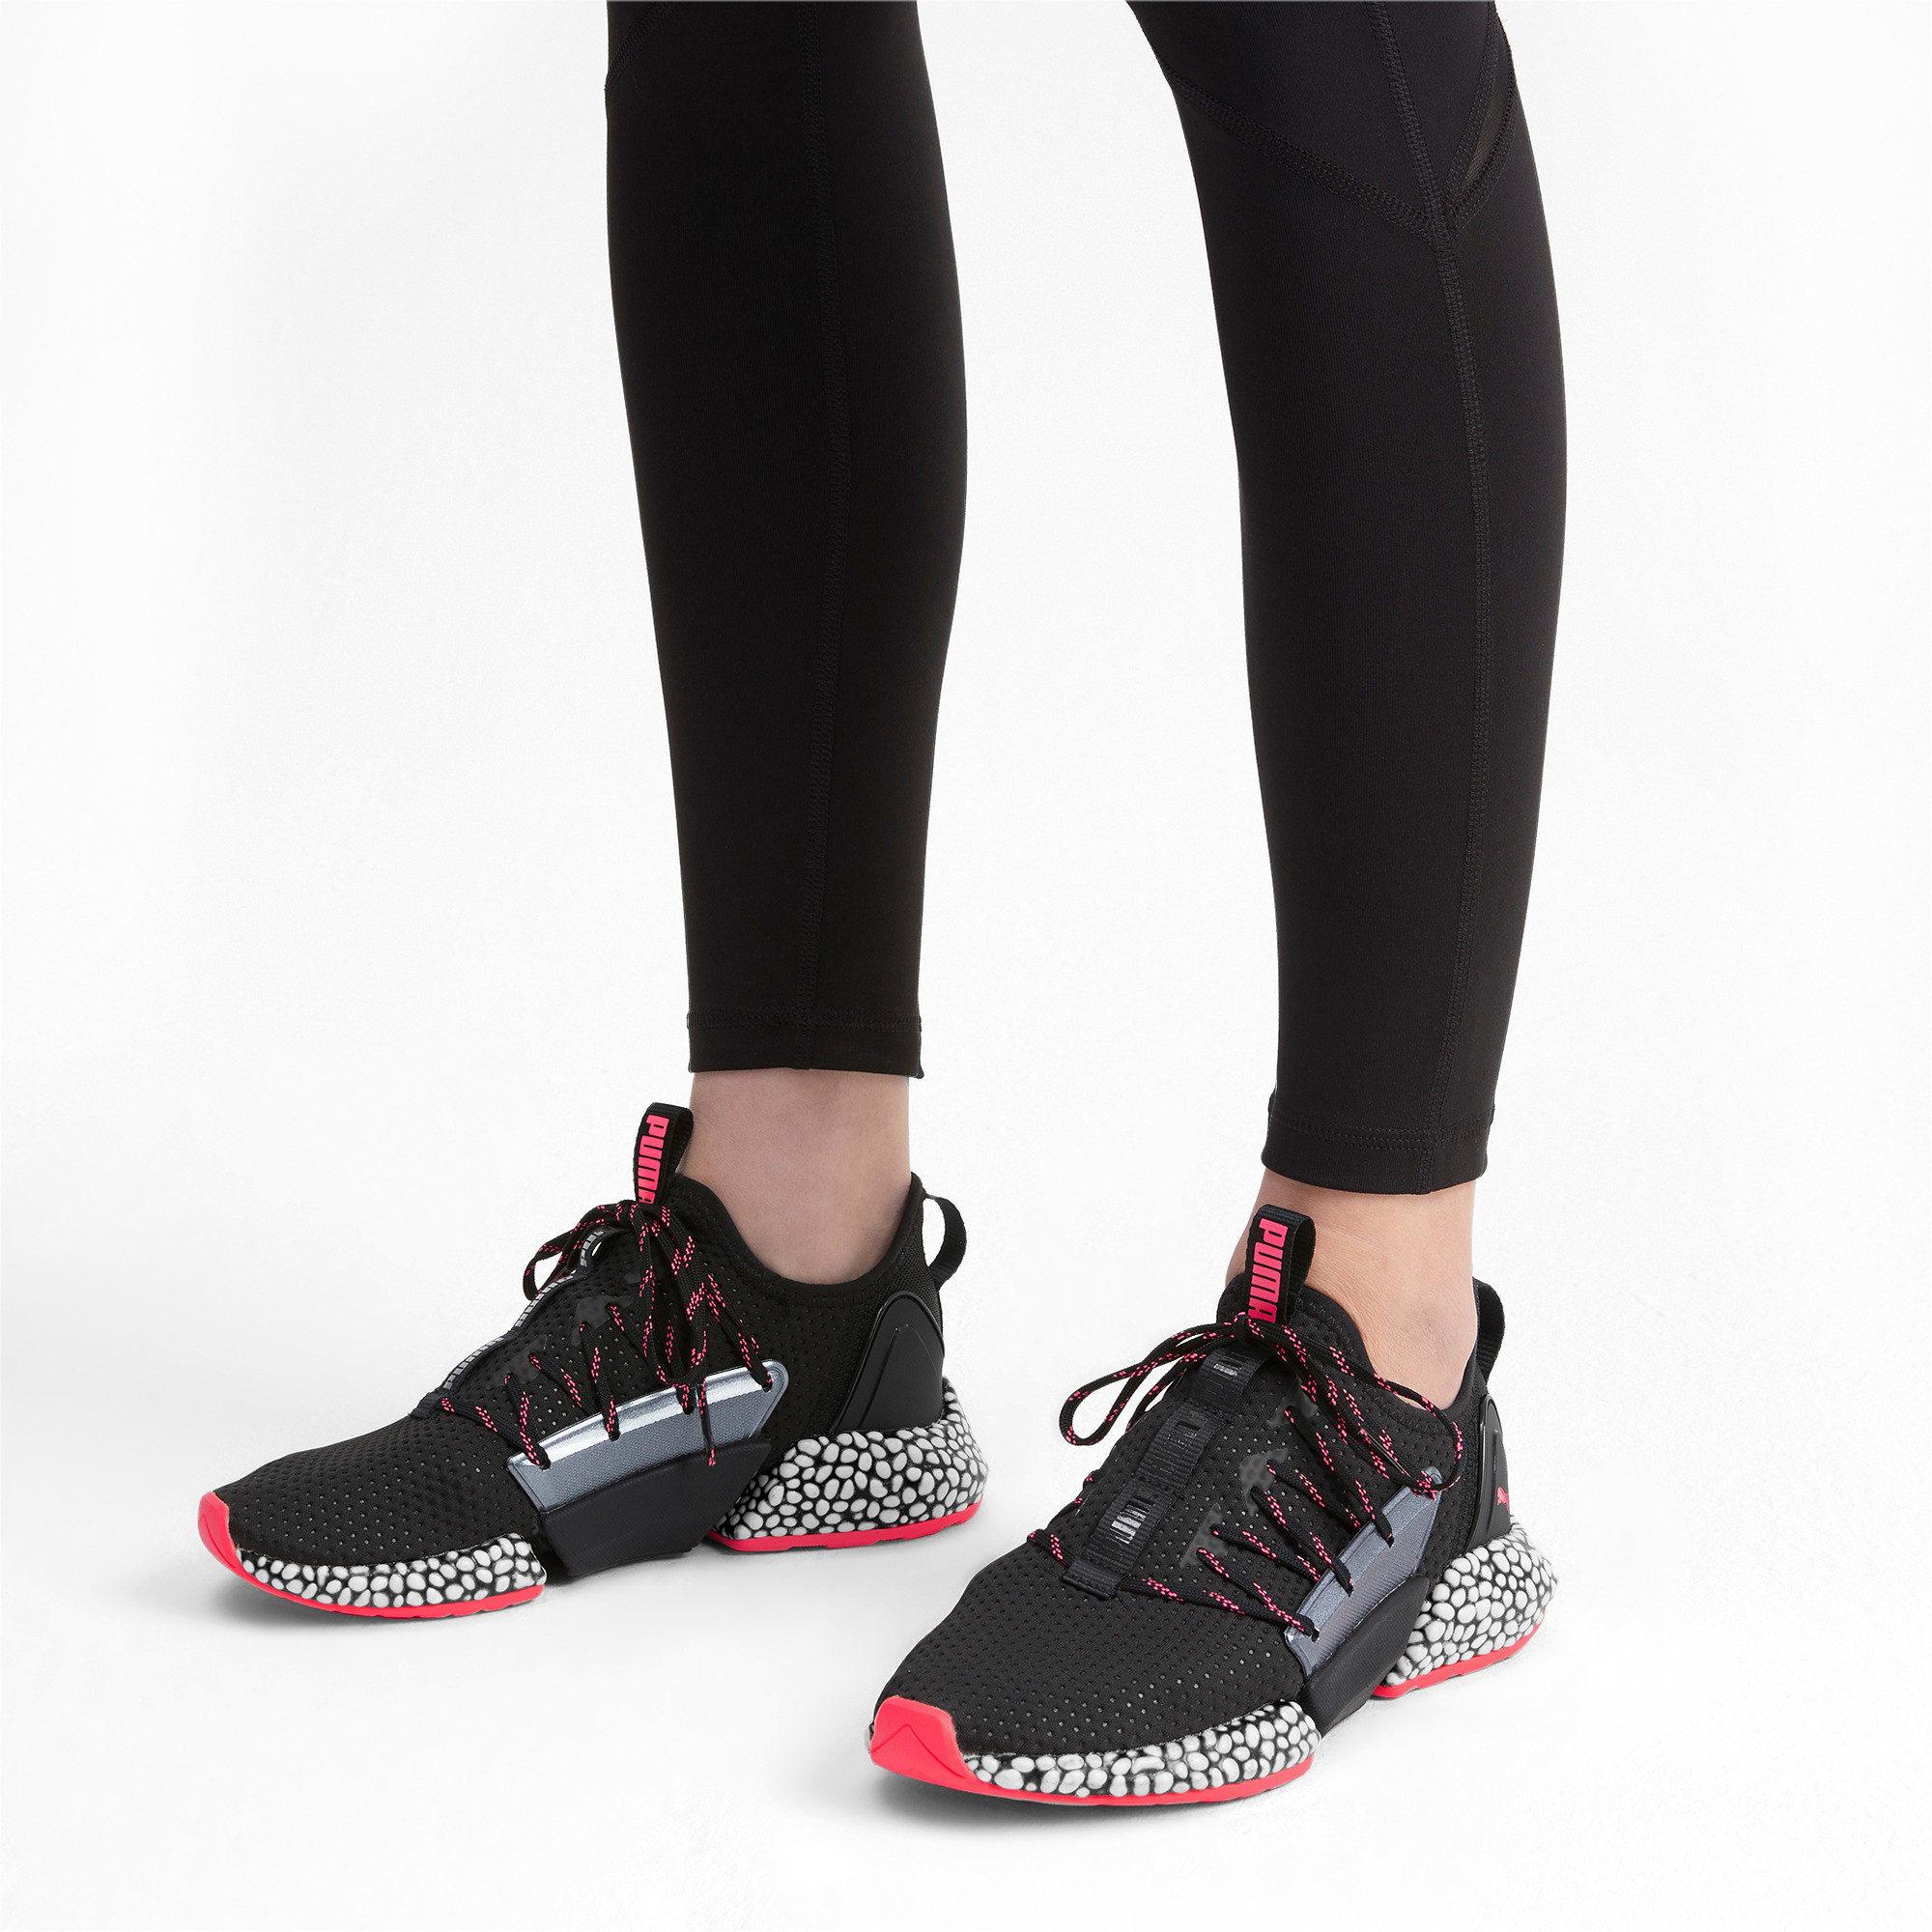 Thumbnail 2 of HYBRID Rocket Aero Women's Sneakers, Puma Black-Pink Alert, medium